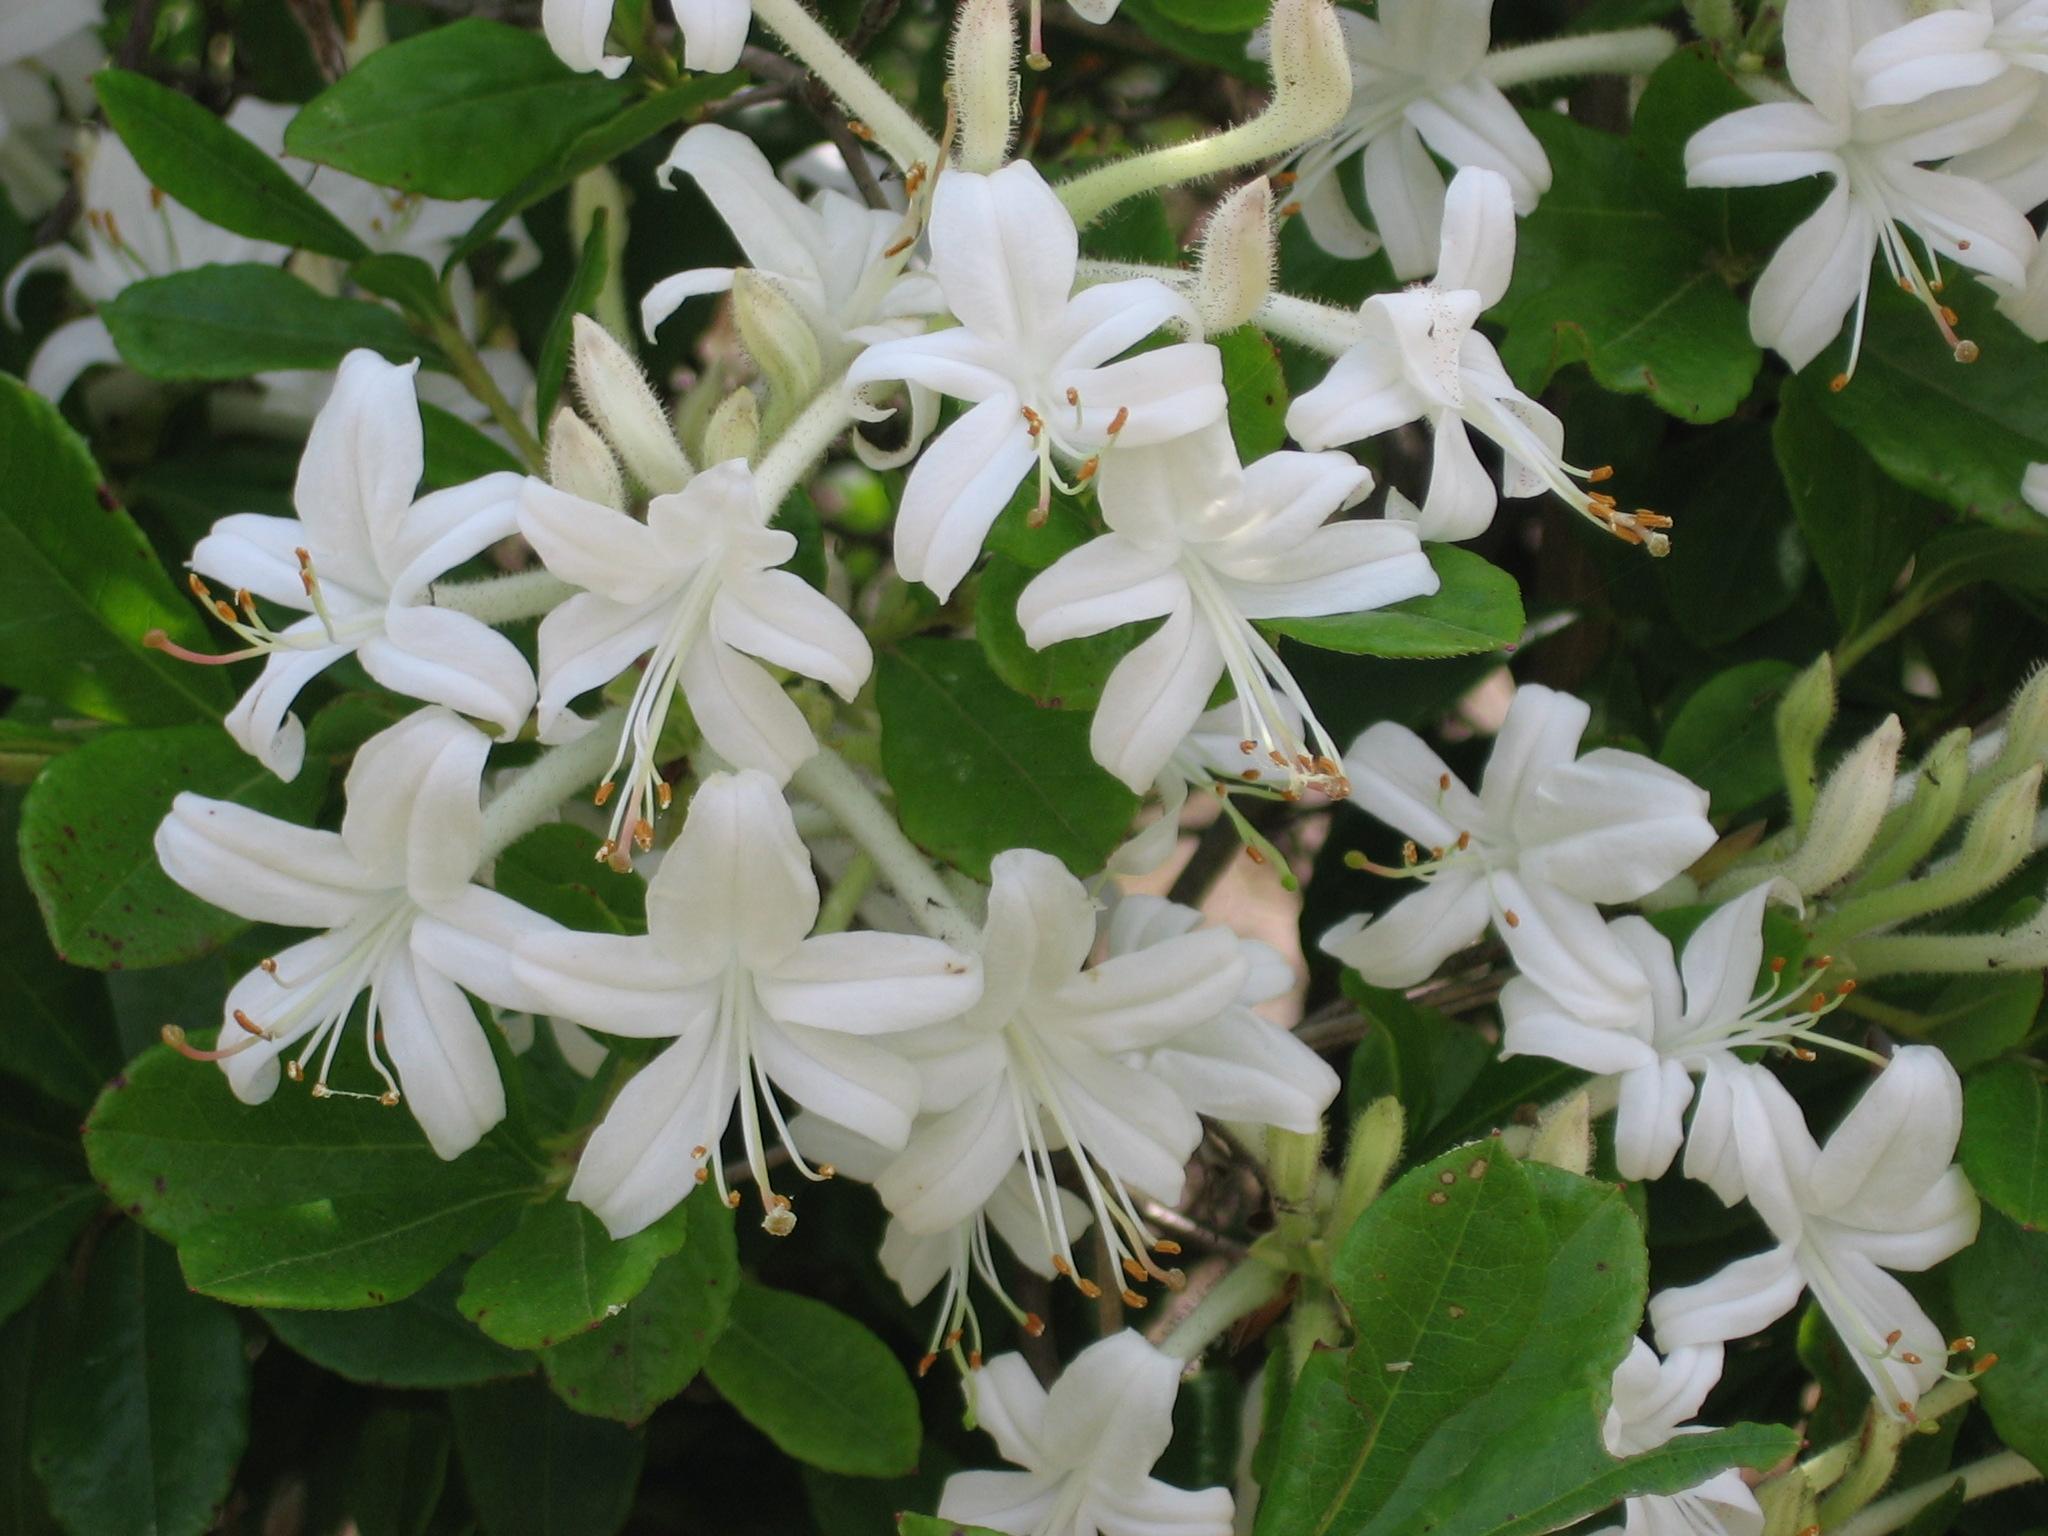 Swamp Azalea Image Abundant Small Fragrant White Flowers